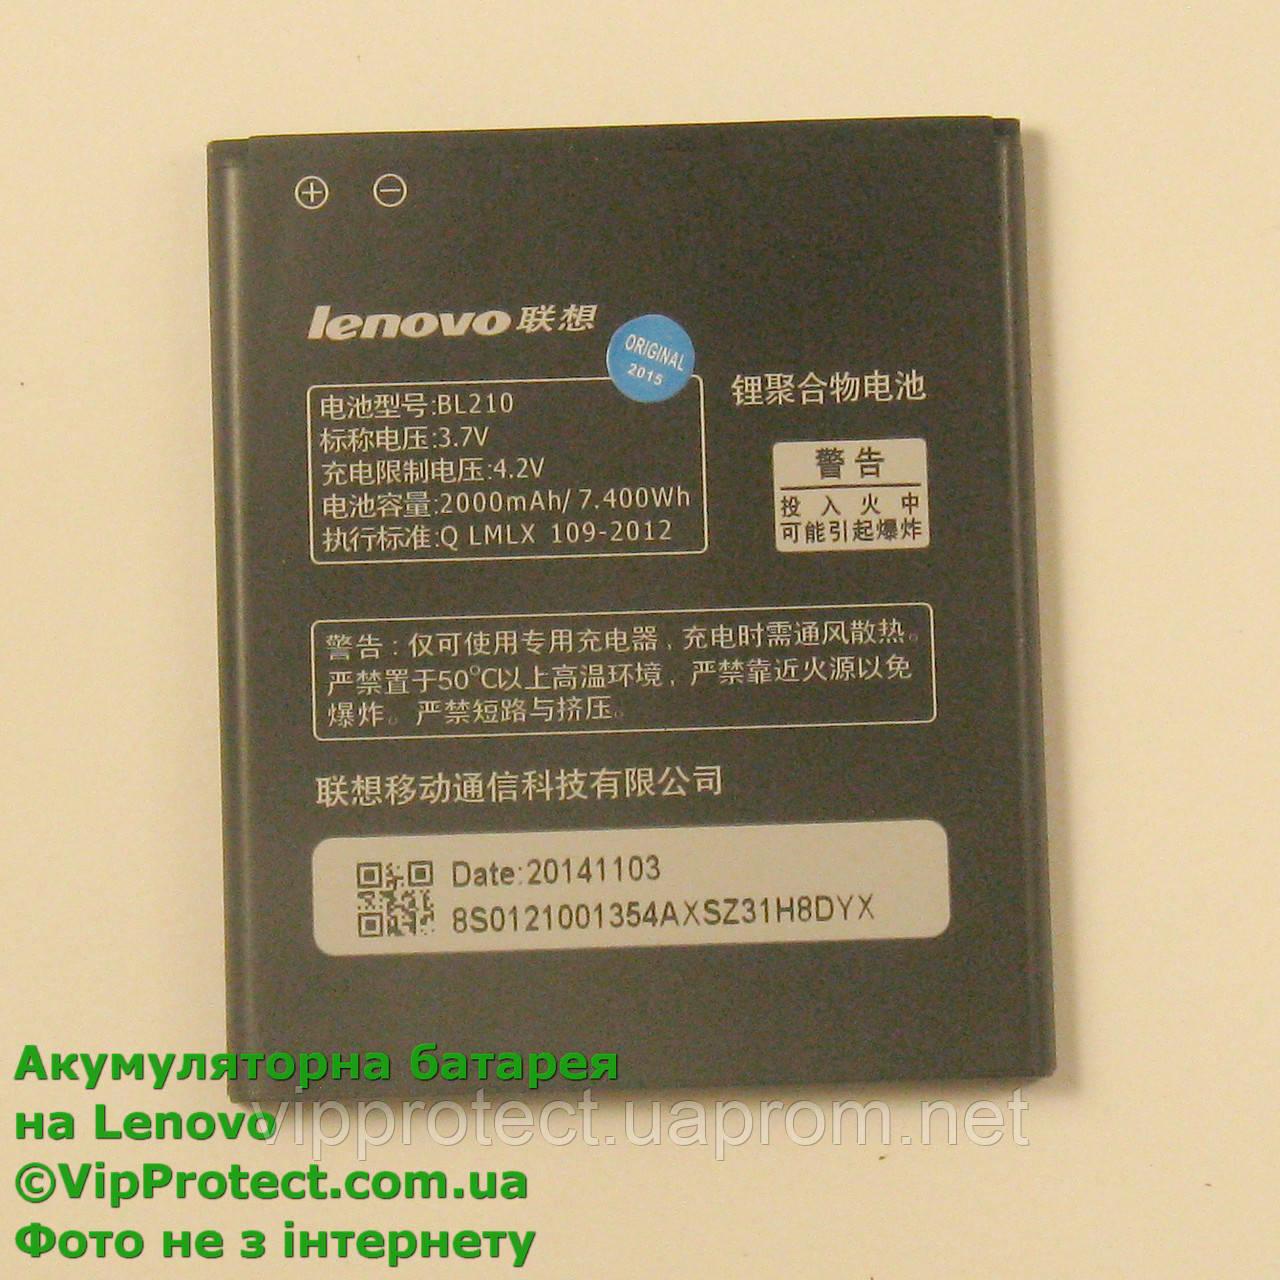 Lenovo A758t BL210 акумулятор 2000мА⋅год оригінальний